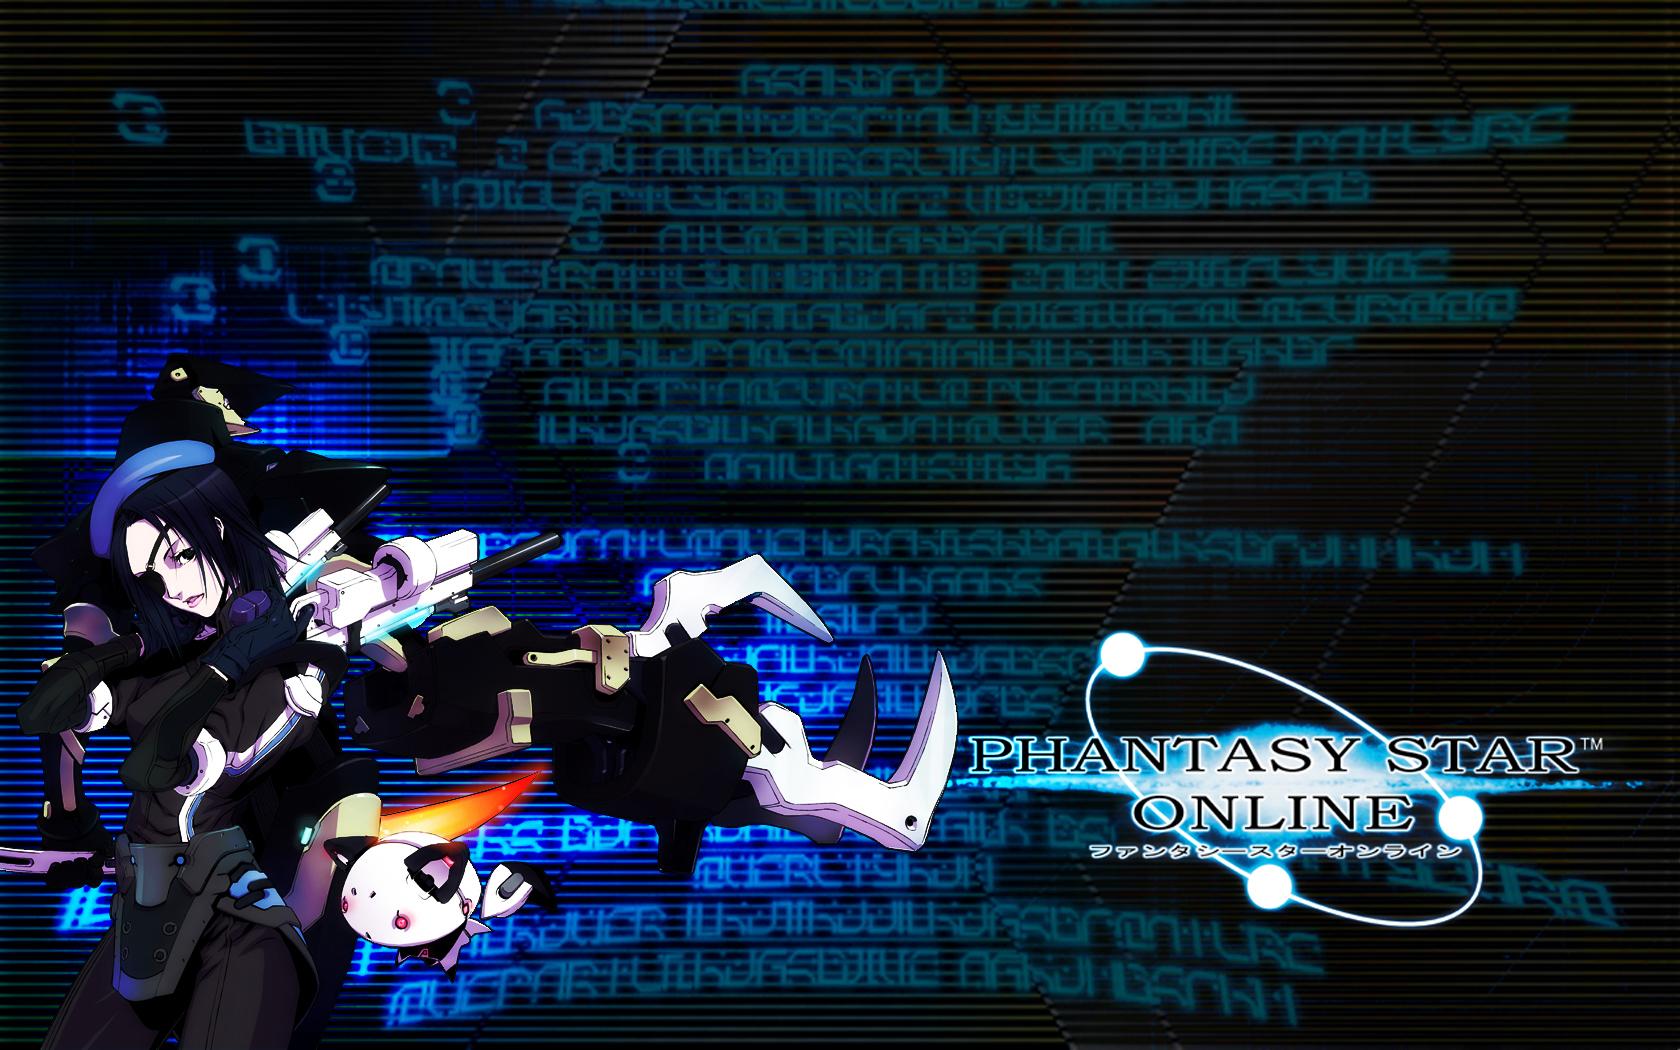 Phantasy Star Online Wallpaper: Phantasy Star Online Wallpaper And Background Image